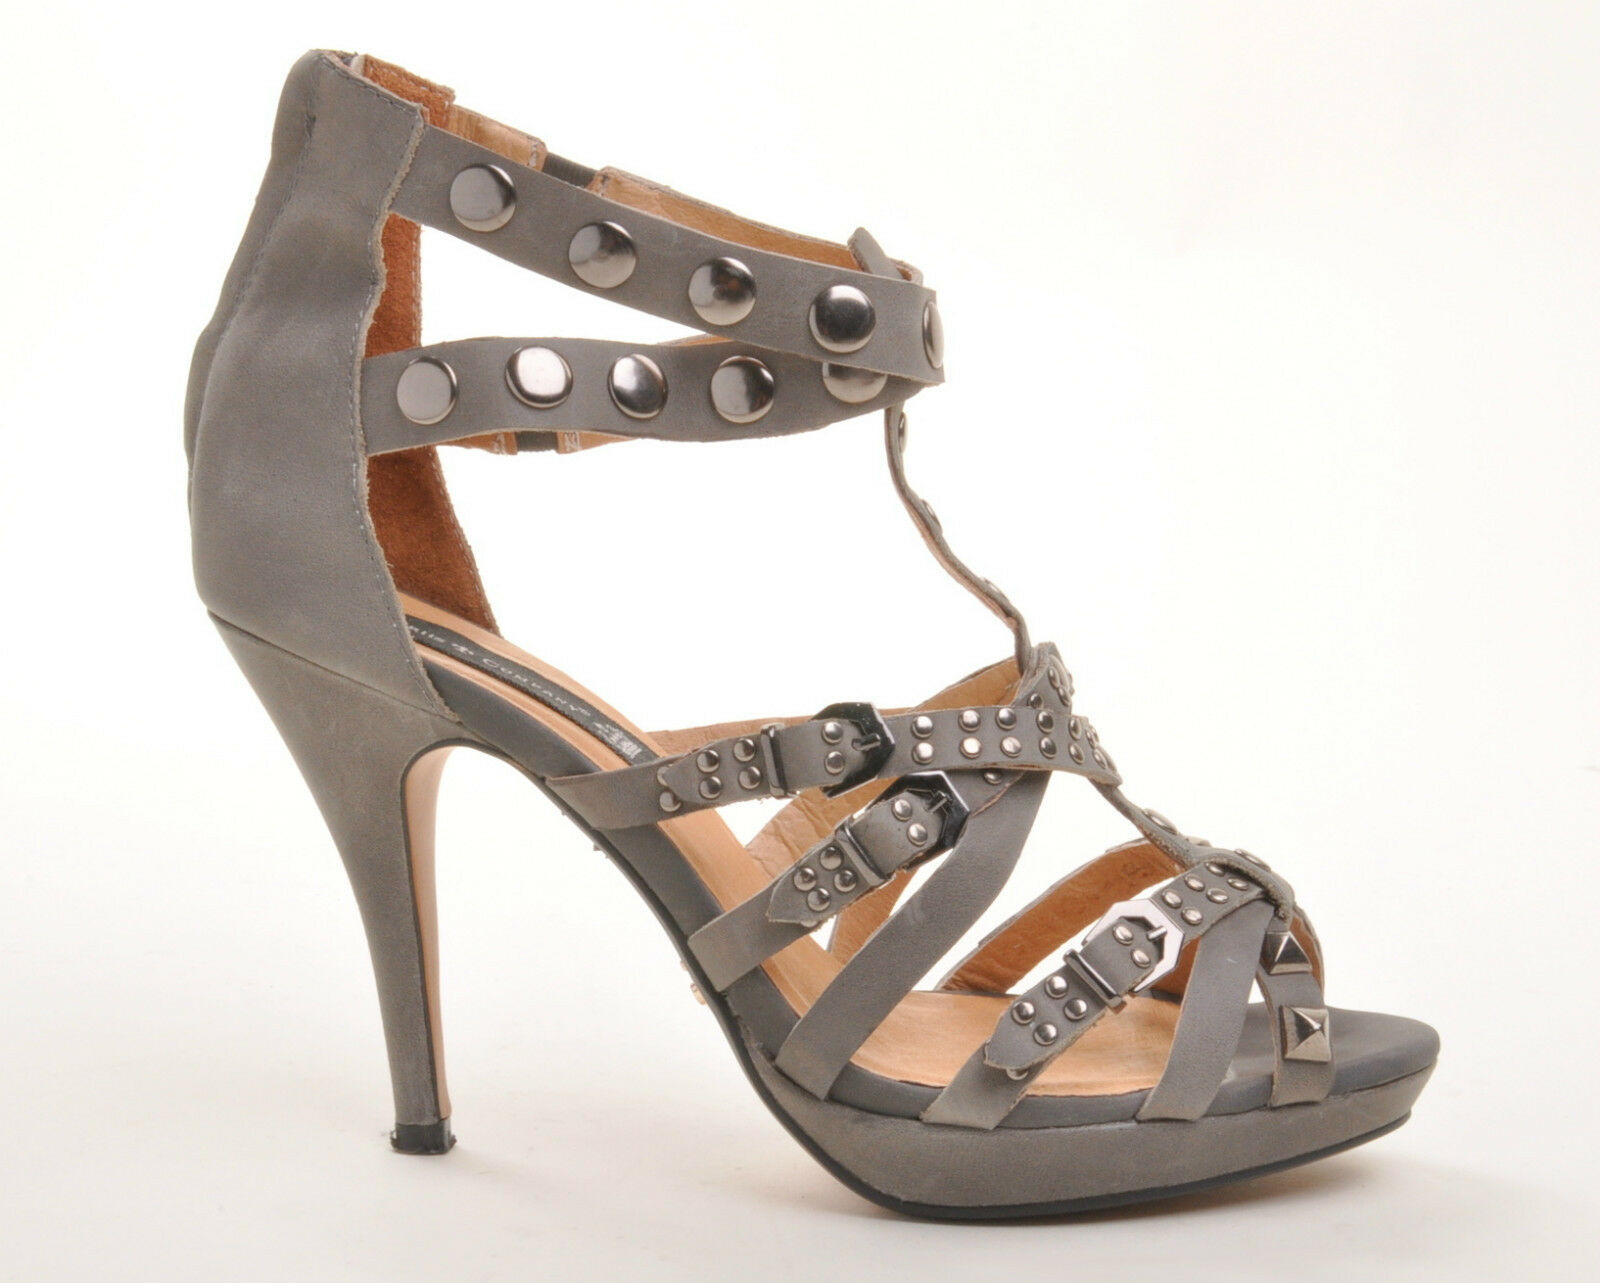 Friis & Company Company Company High Heels Pumps Glam Rock Chic Leder grau Gr 41 (urspr  ) 422be8